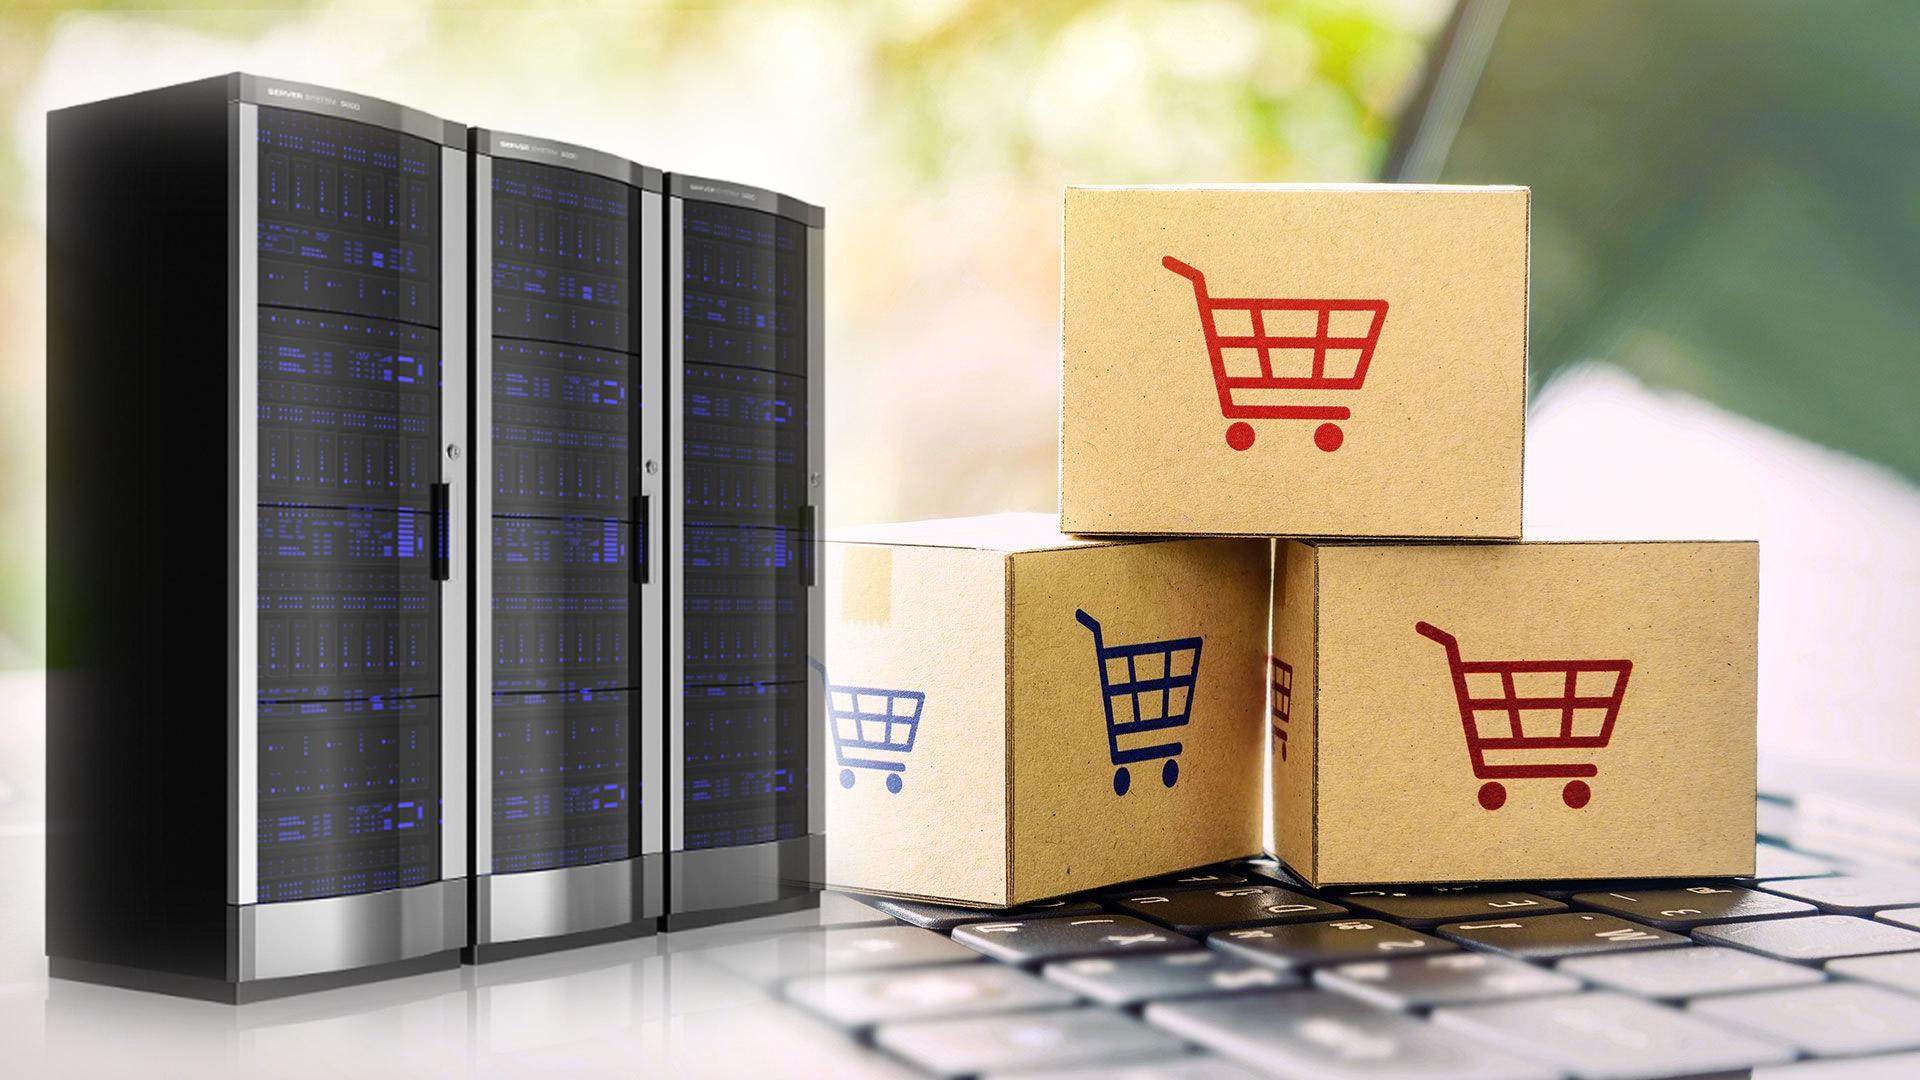 Alojamento E-Commerce